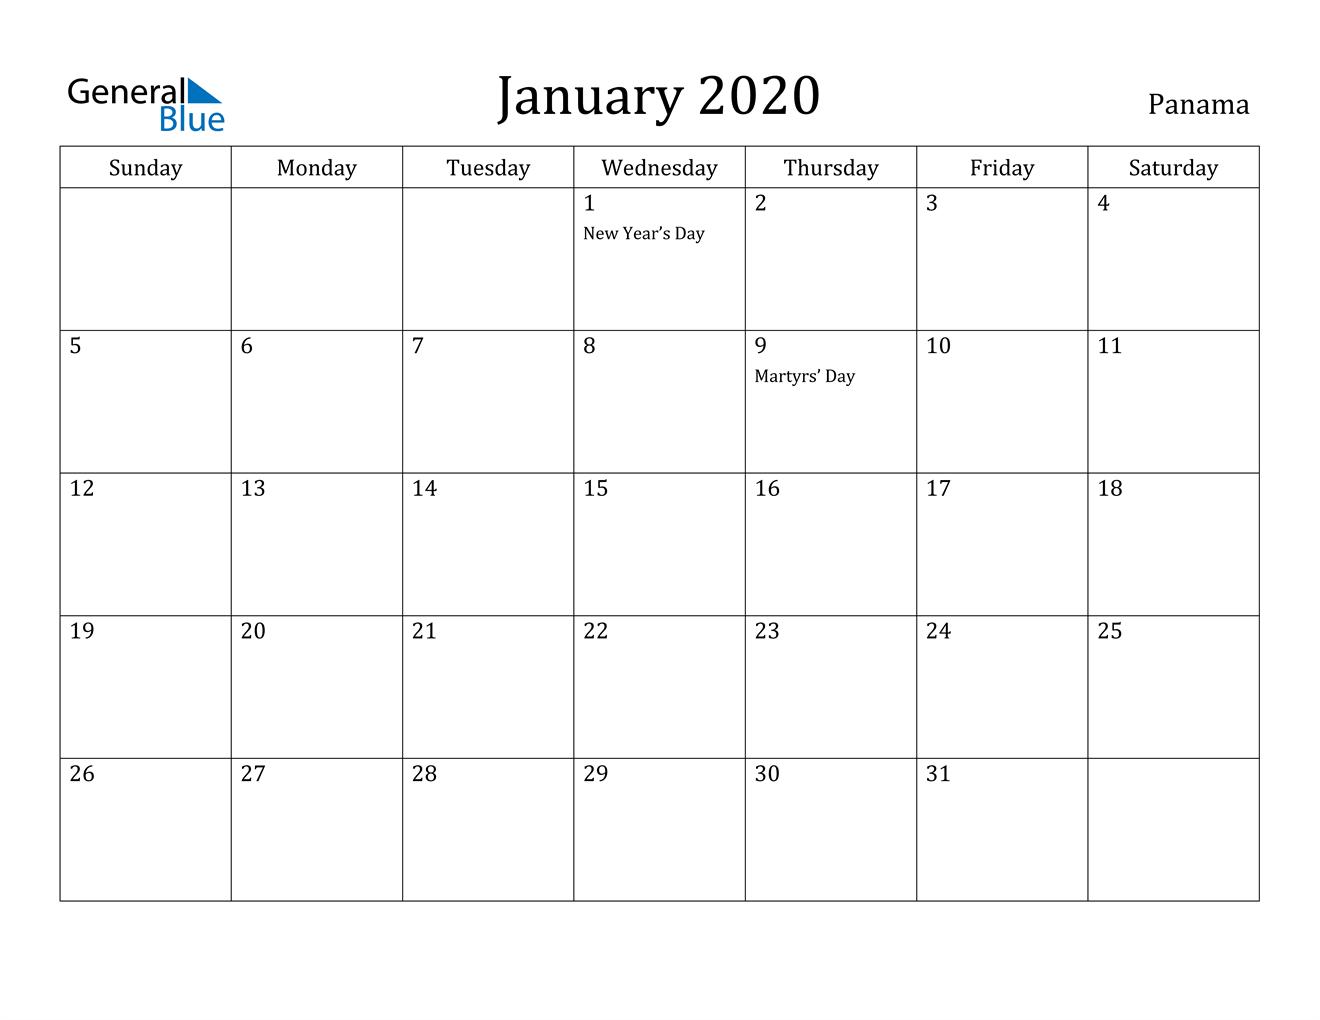 Image of January 2020 Panama Calendar with Holidays Calendar